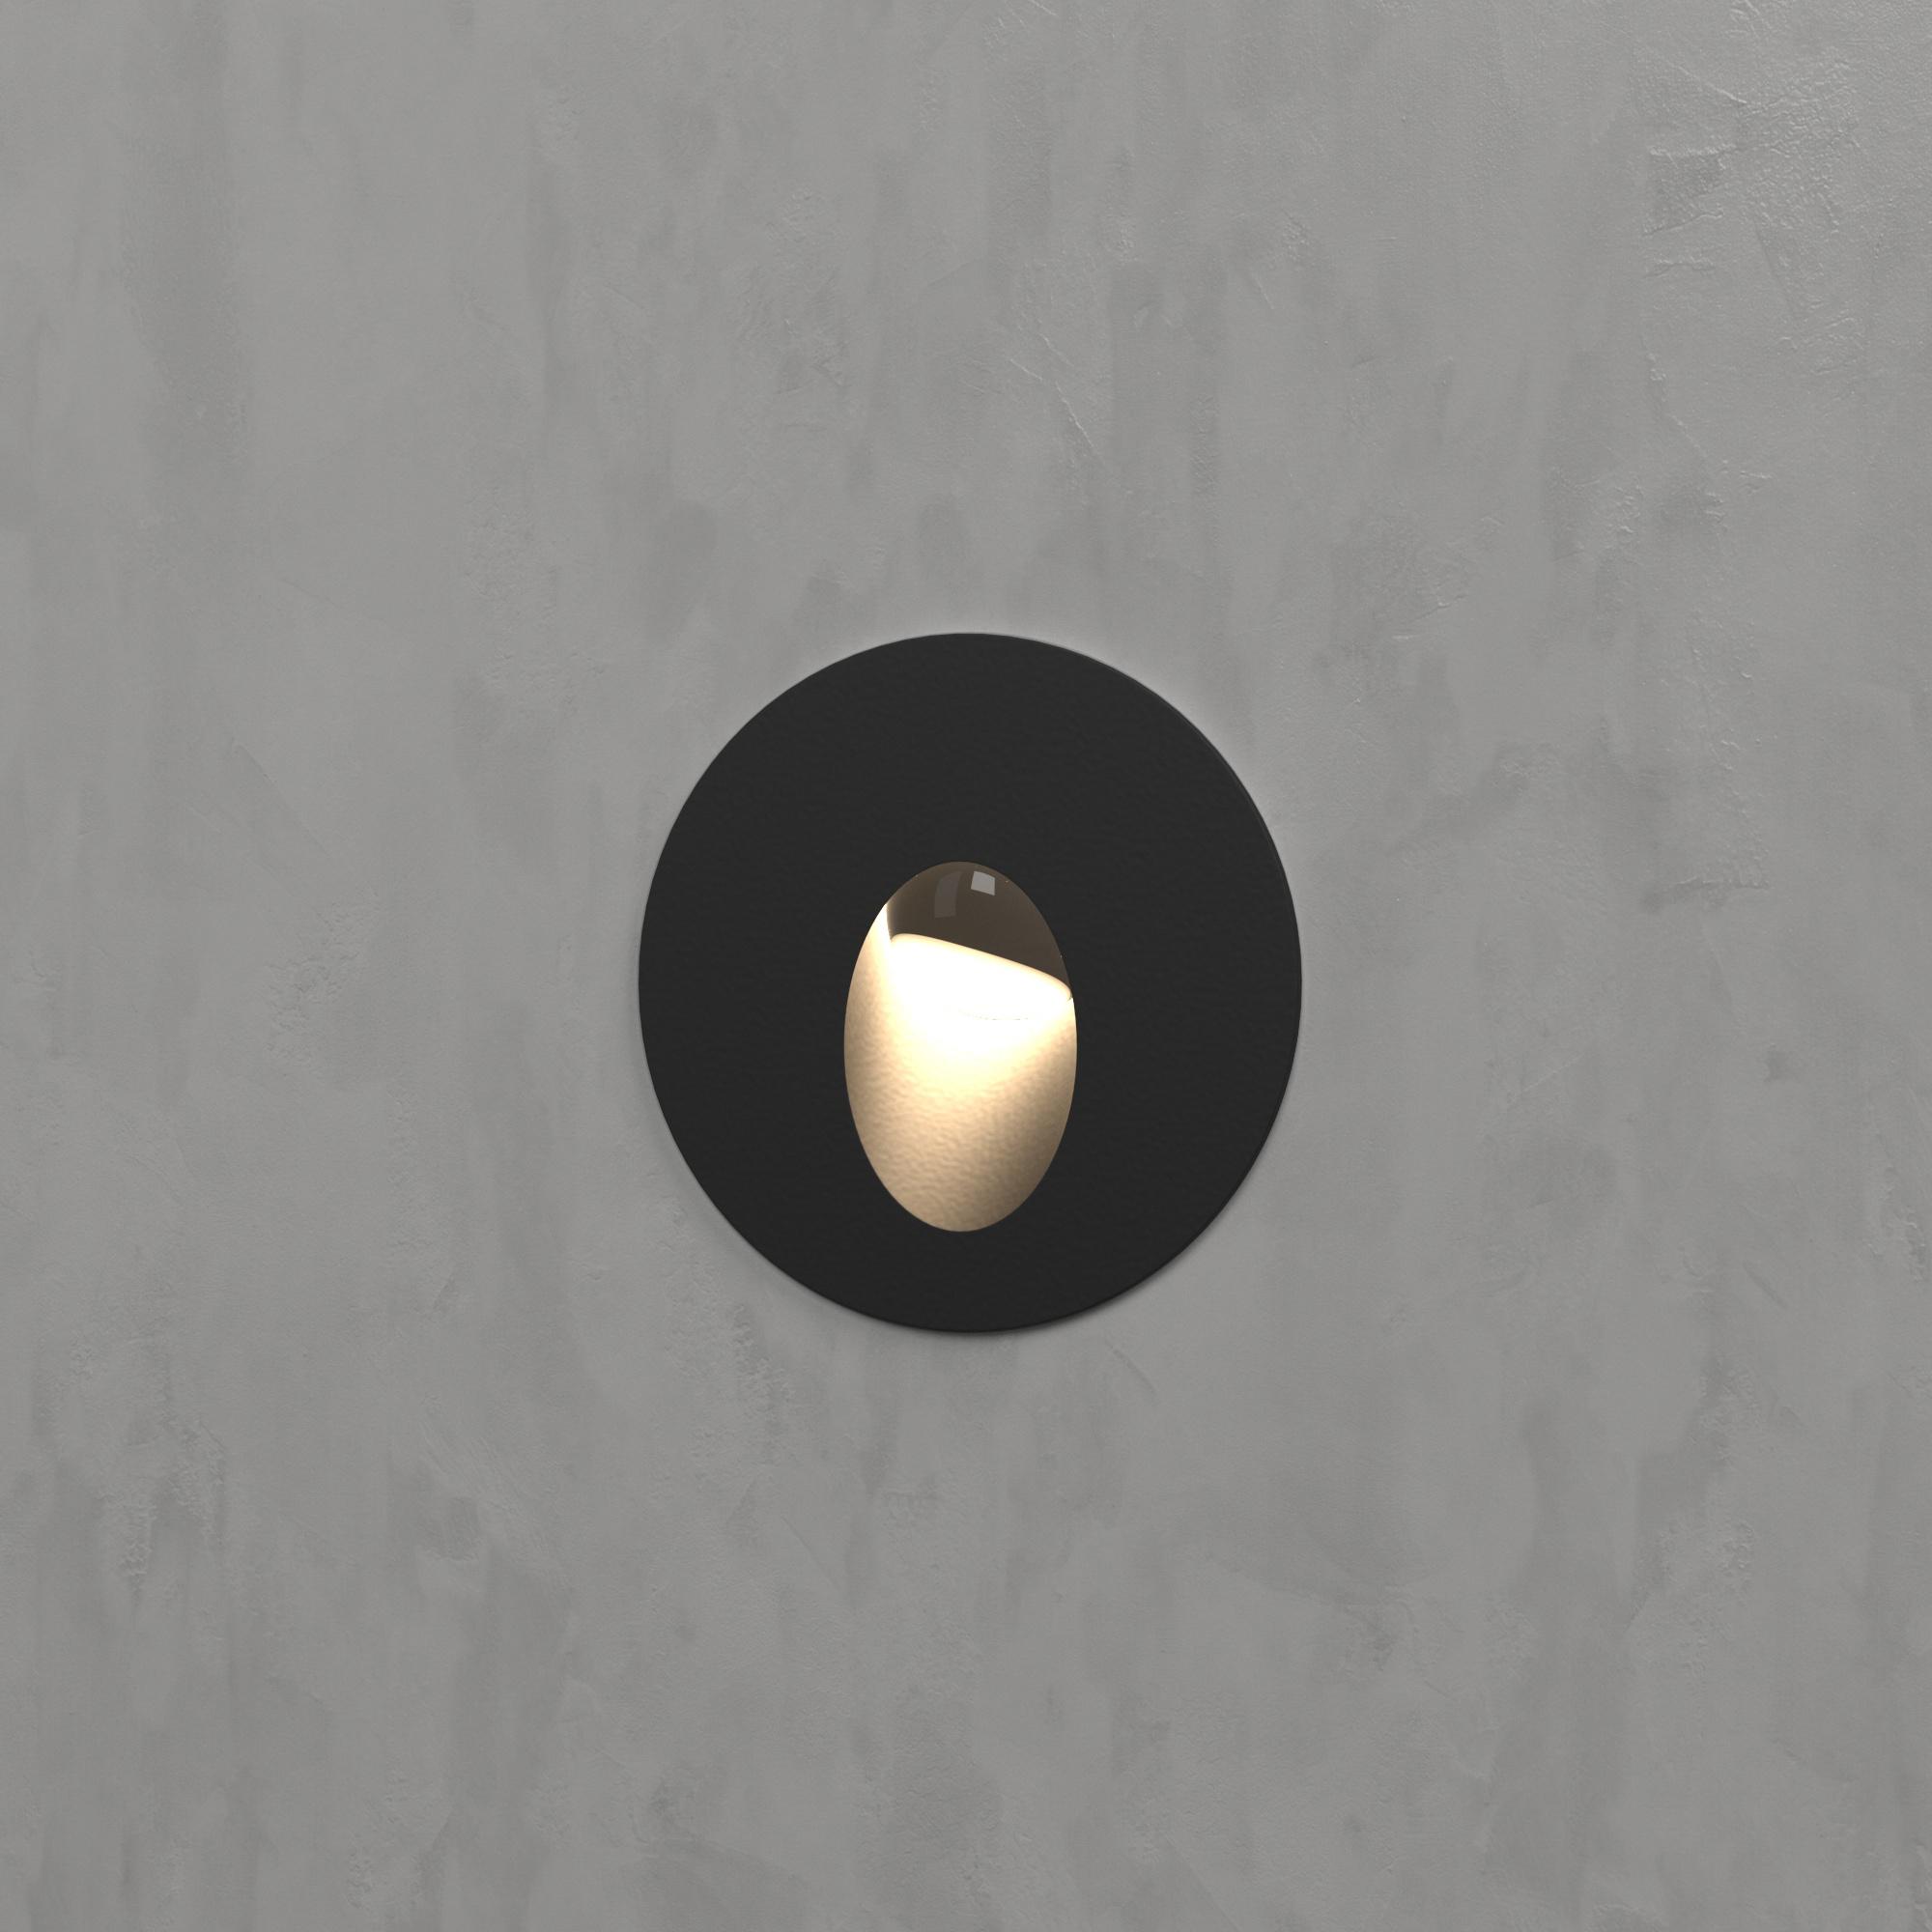 Подсветка для лестниц Elektrostandard MRL LED 1101